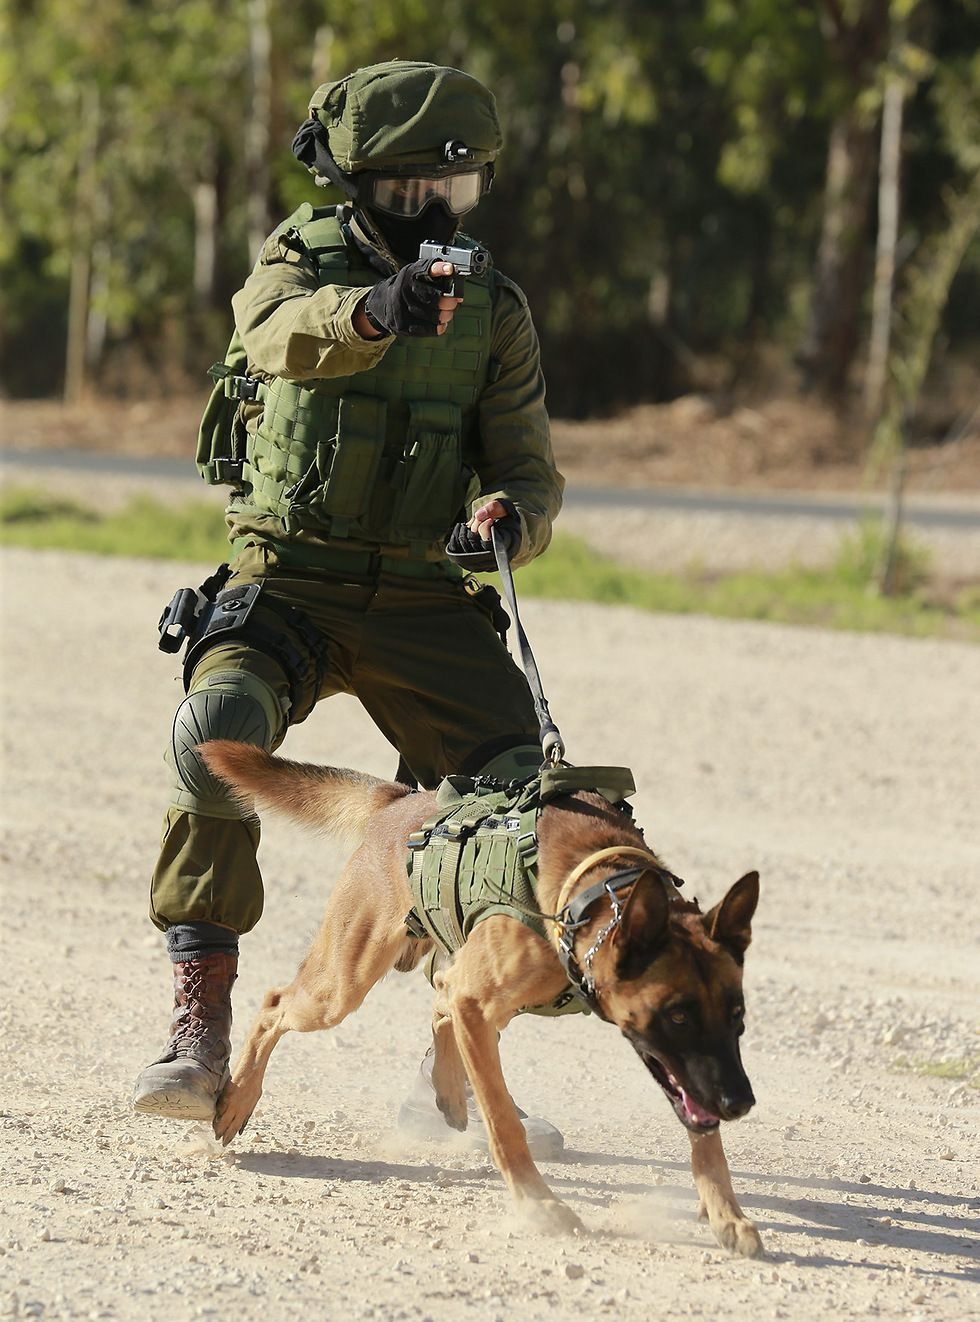 Military War K9 Hero Handler God Bless Protect Both Of You